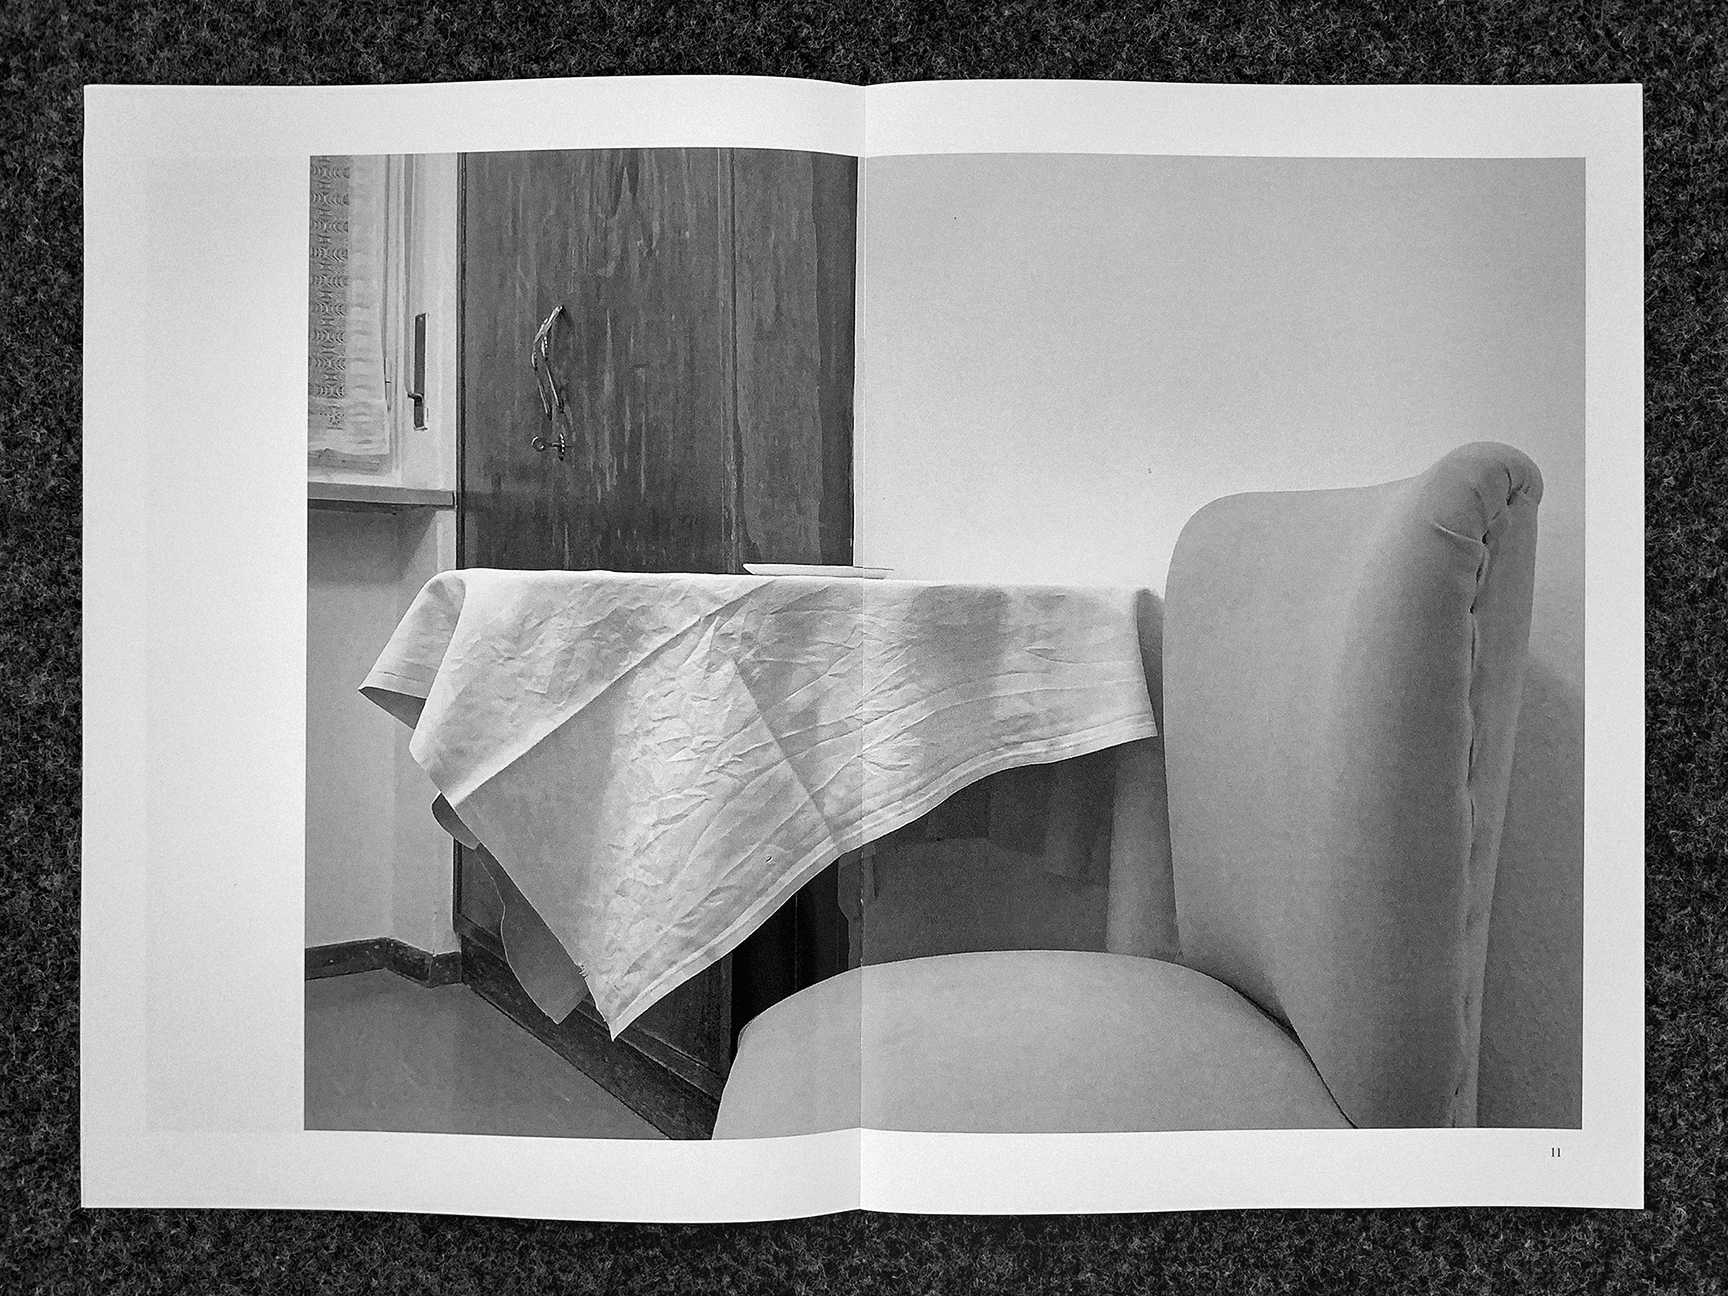 0219: »Gramsci« | Fuzzy Space | 2019